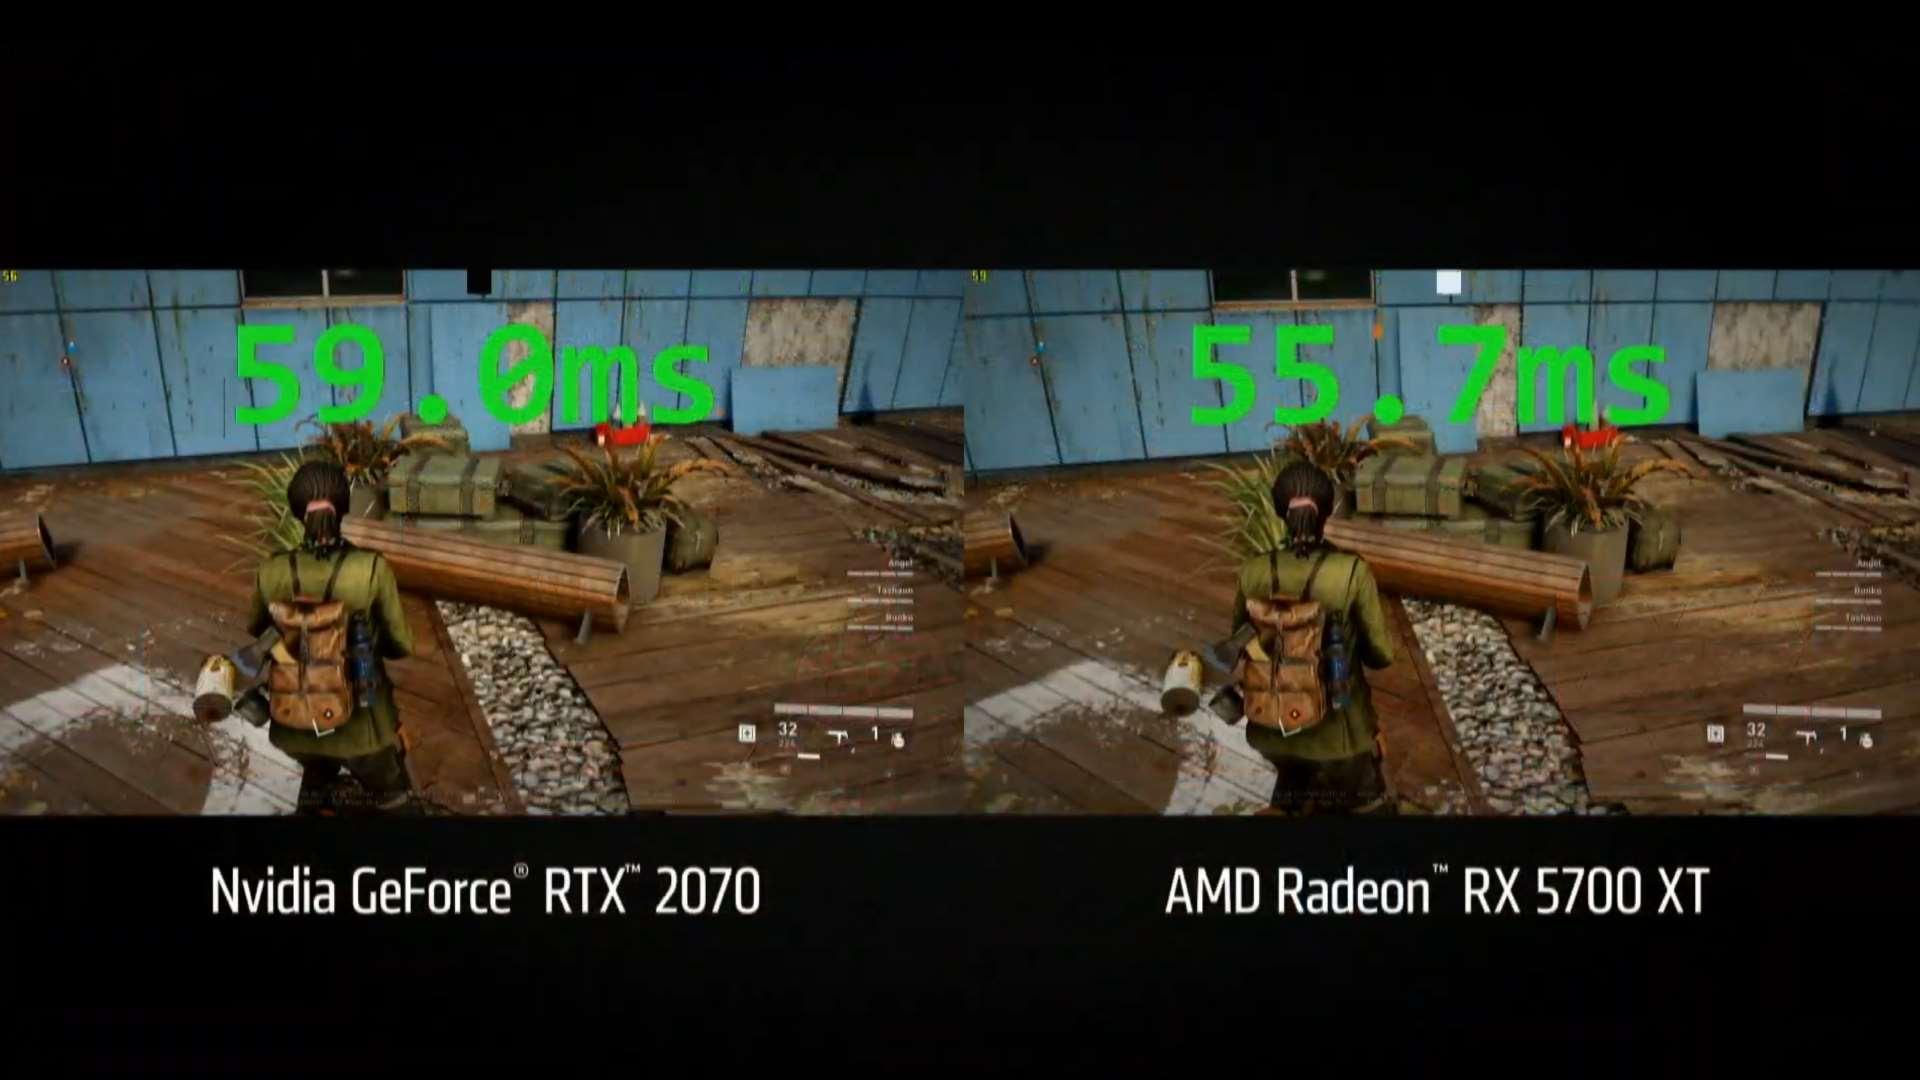 AMD's Navi-based Radeon Anti-Lag feature cuts input latency